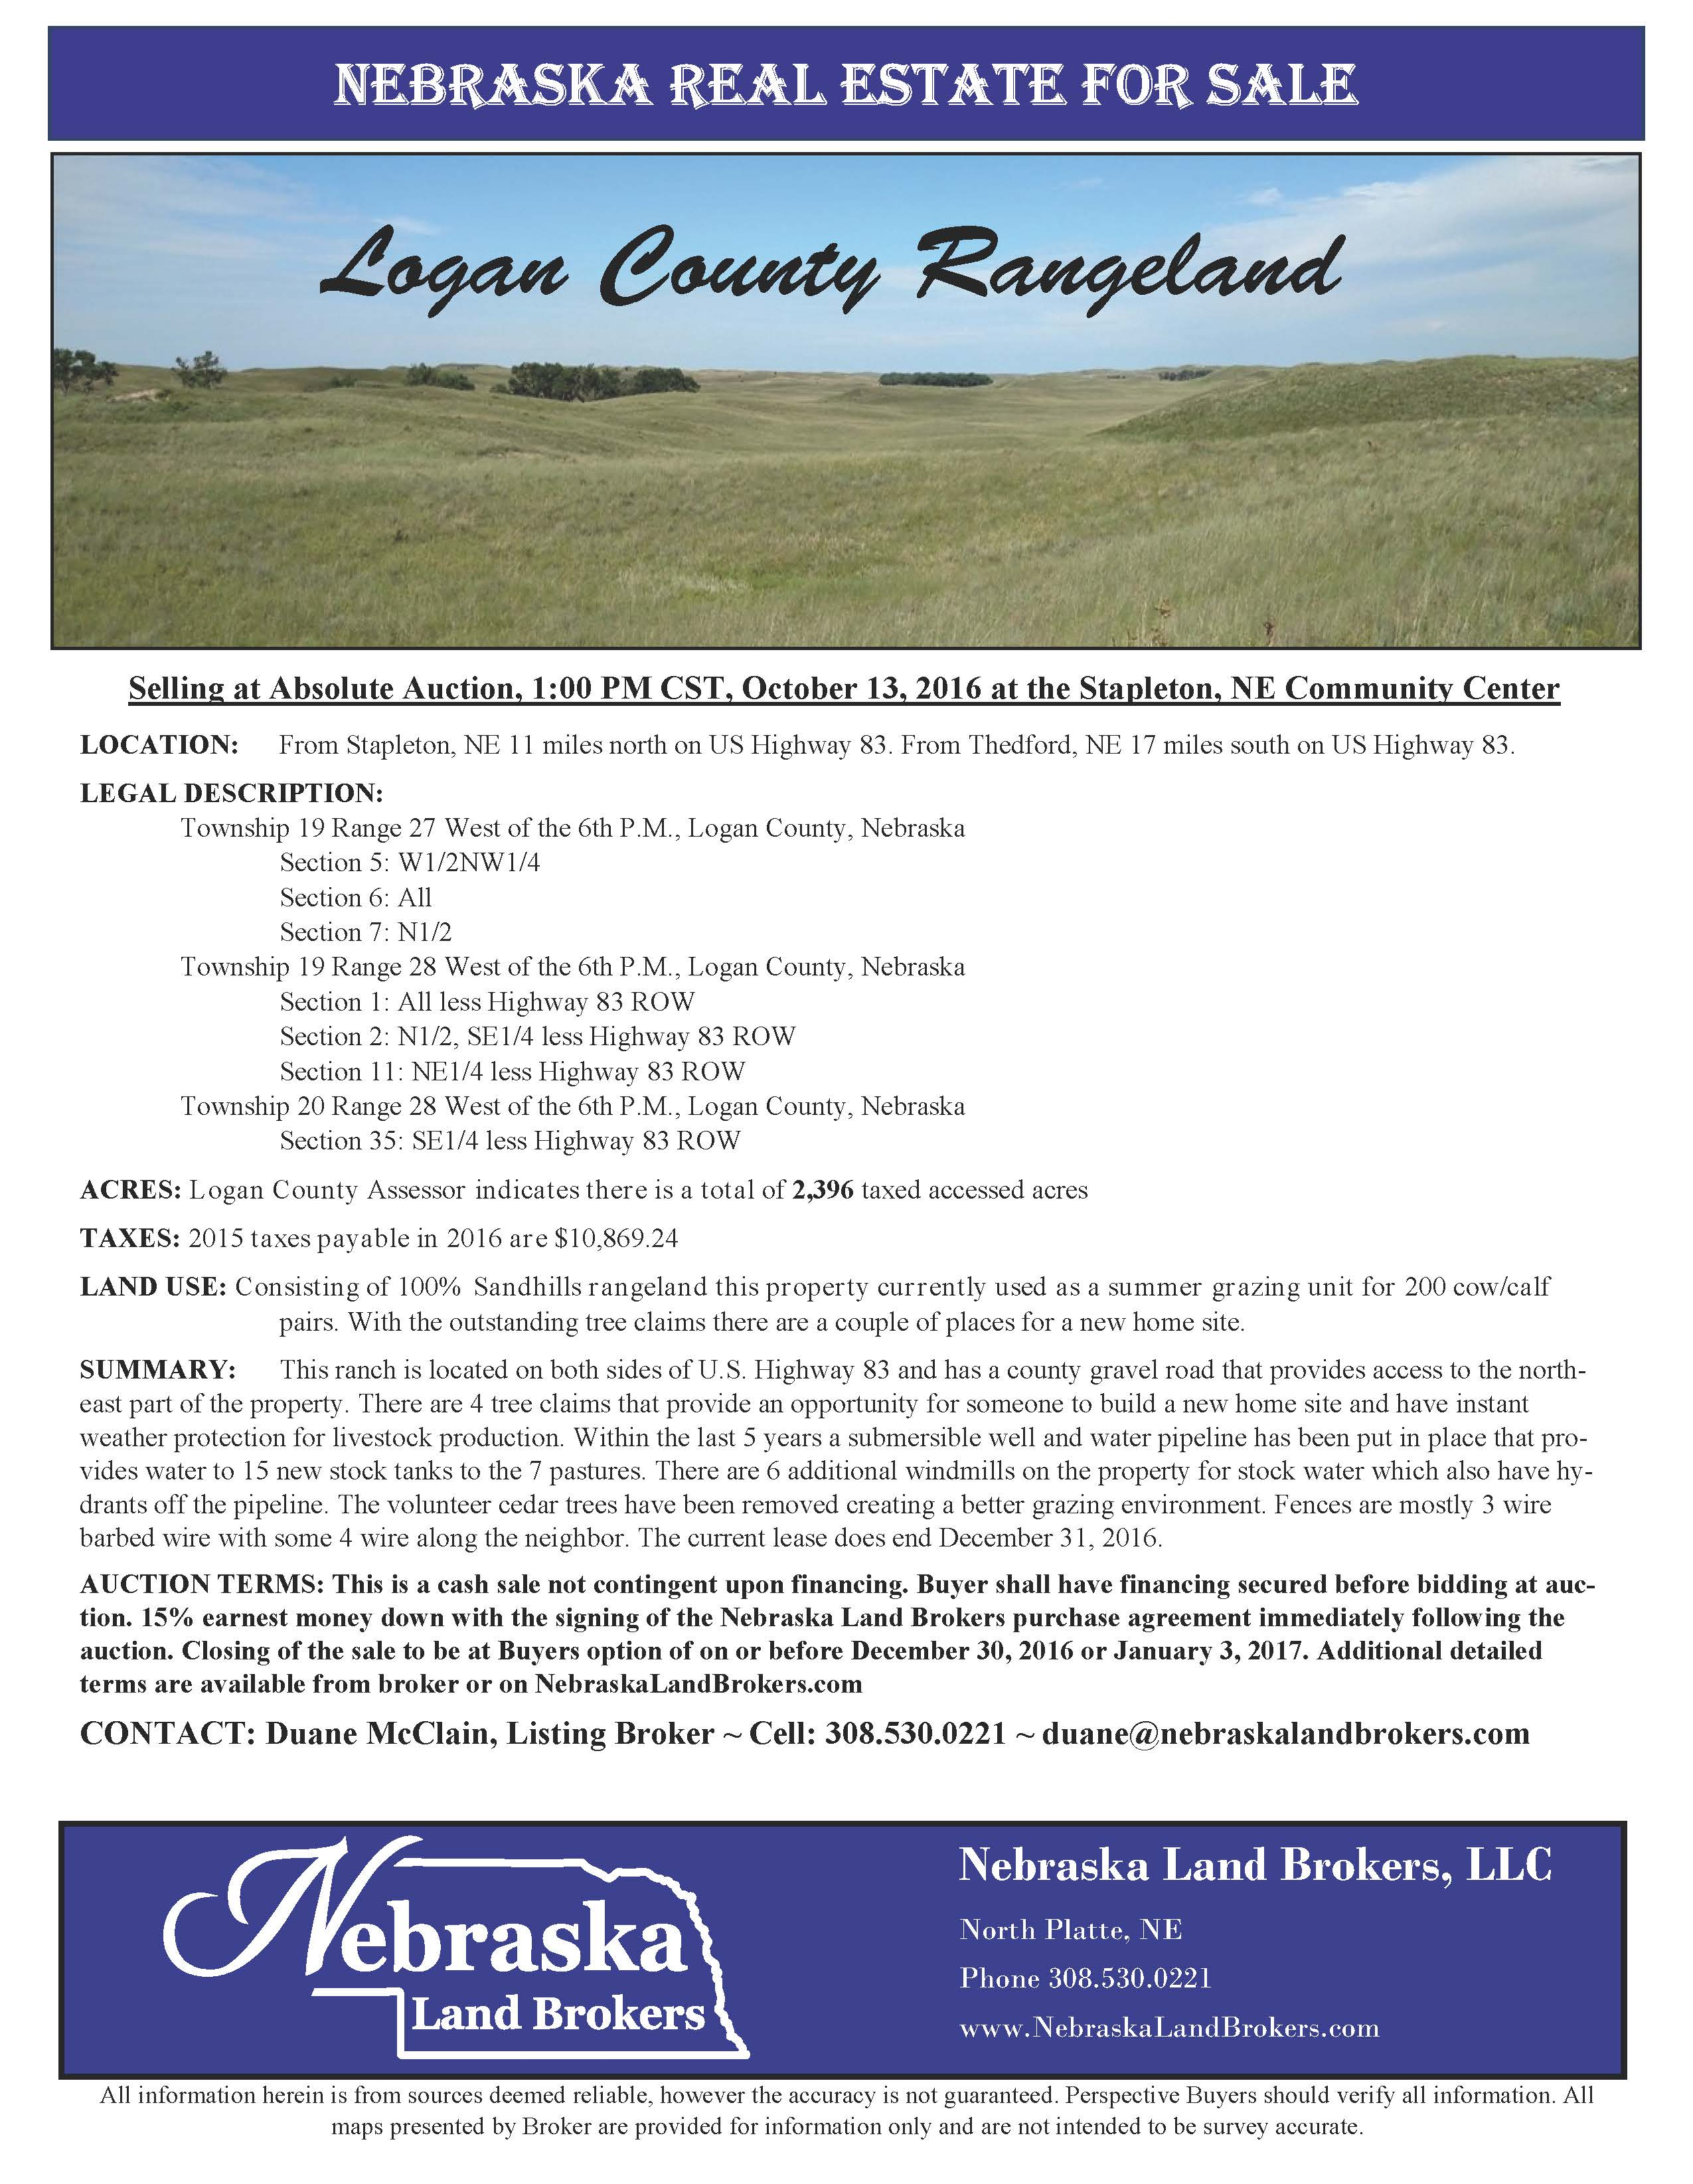 Logan County Rangeland Auction